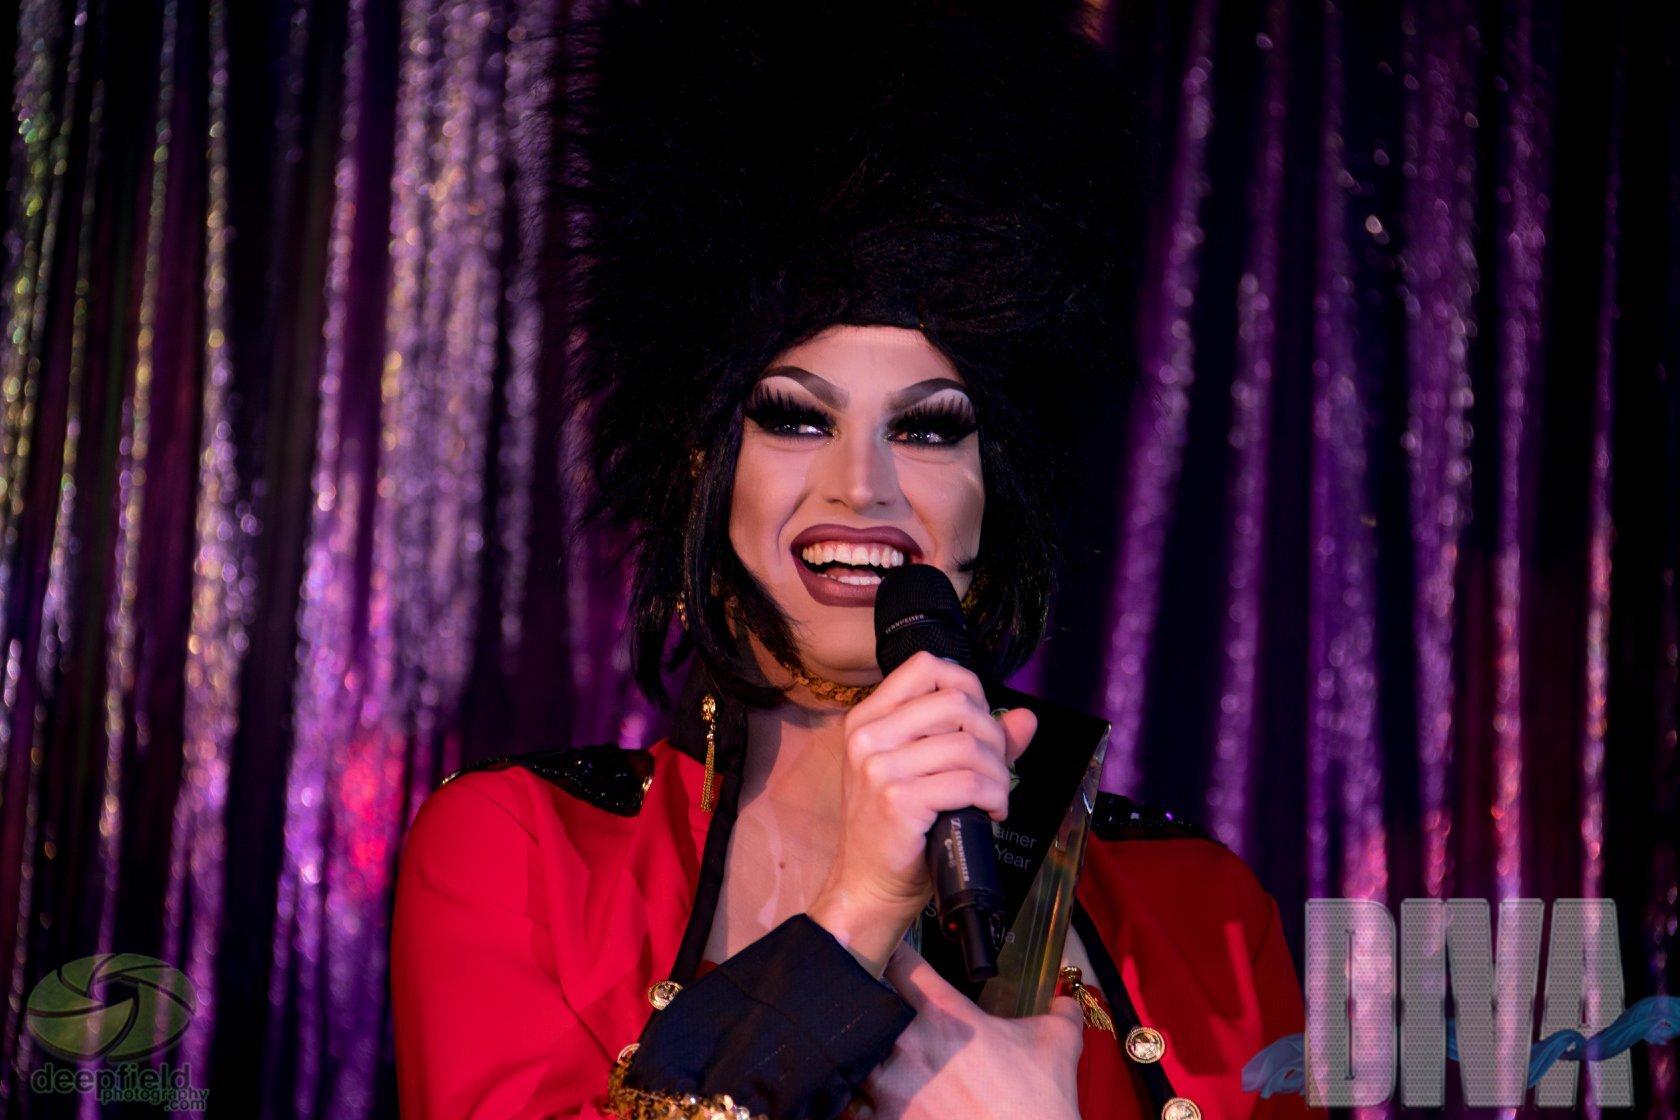 sia-tequila-winner-win-entertainer-of-the-year-diva-awards-sydney-drag-queen-royalty-best-hire-drag-race-australia-2.jpg